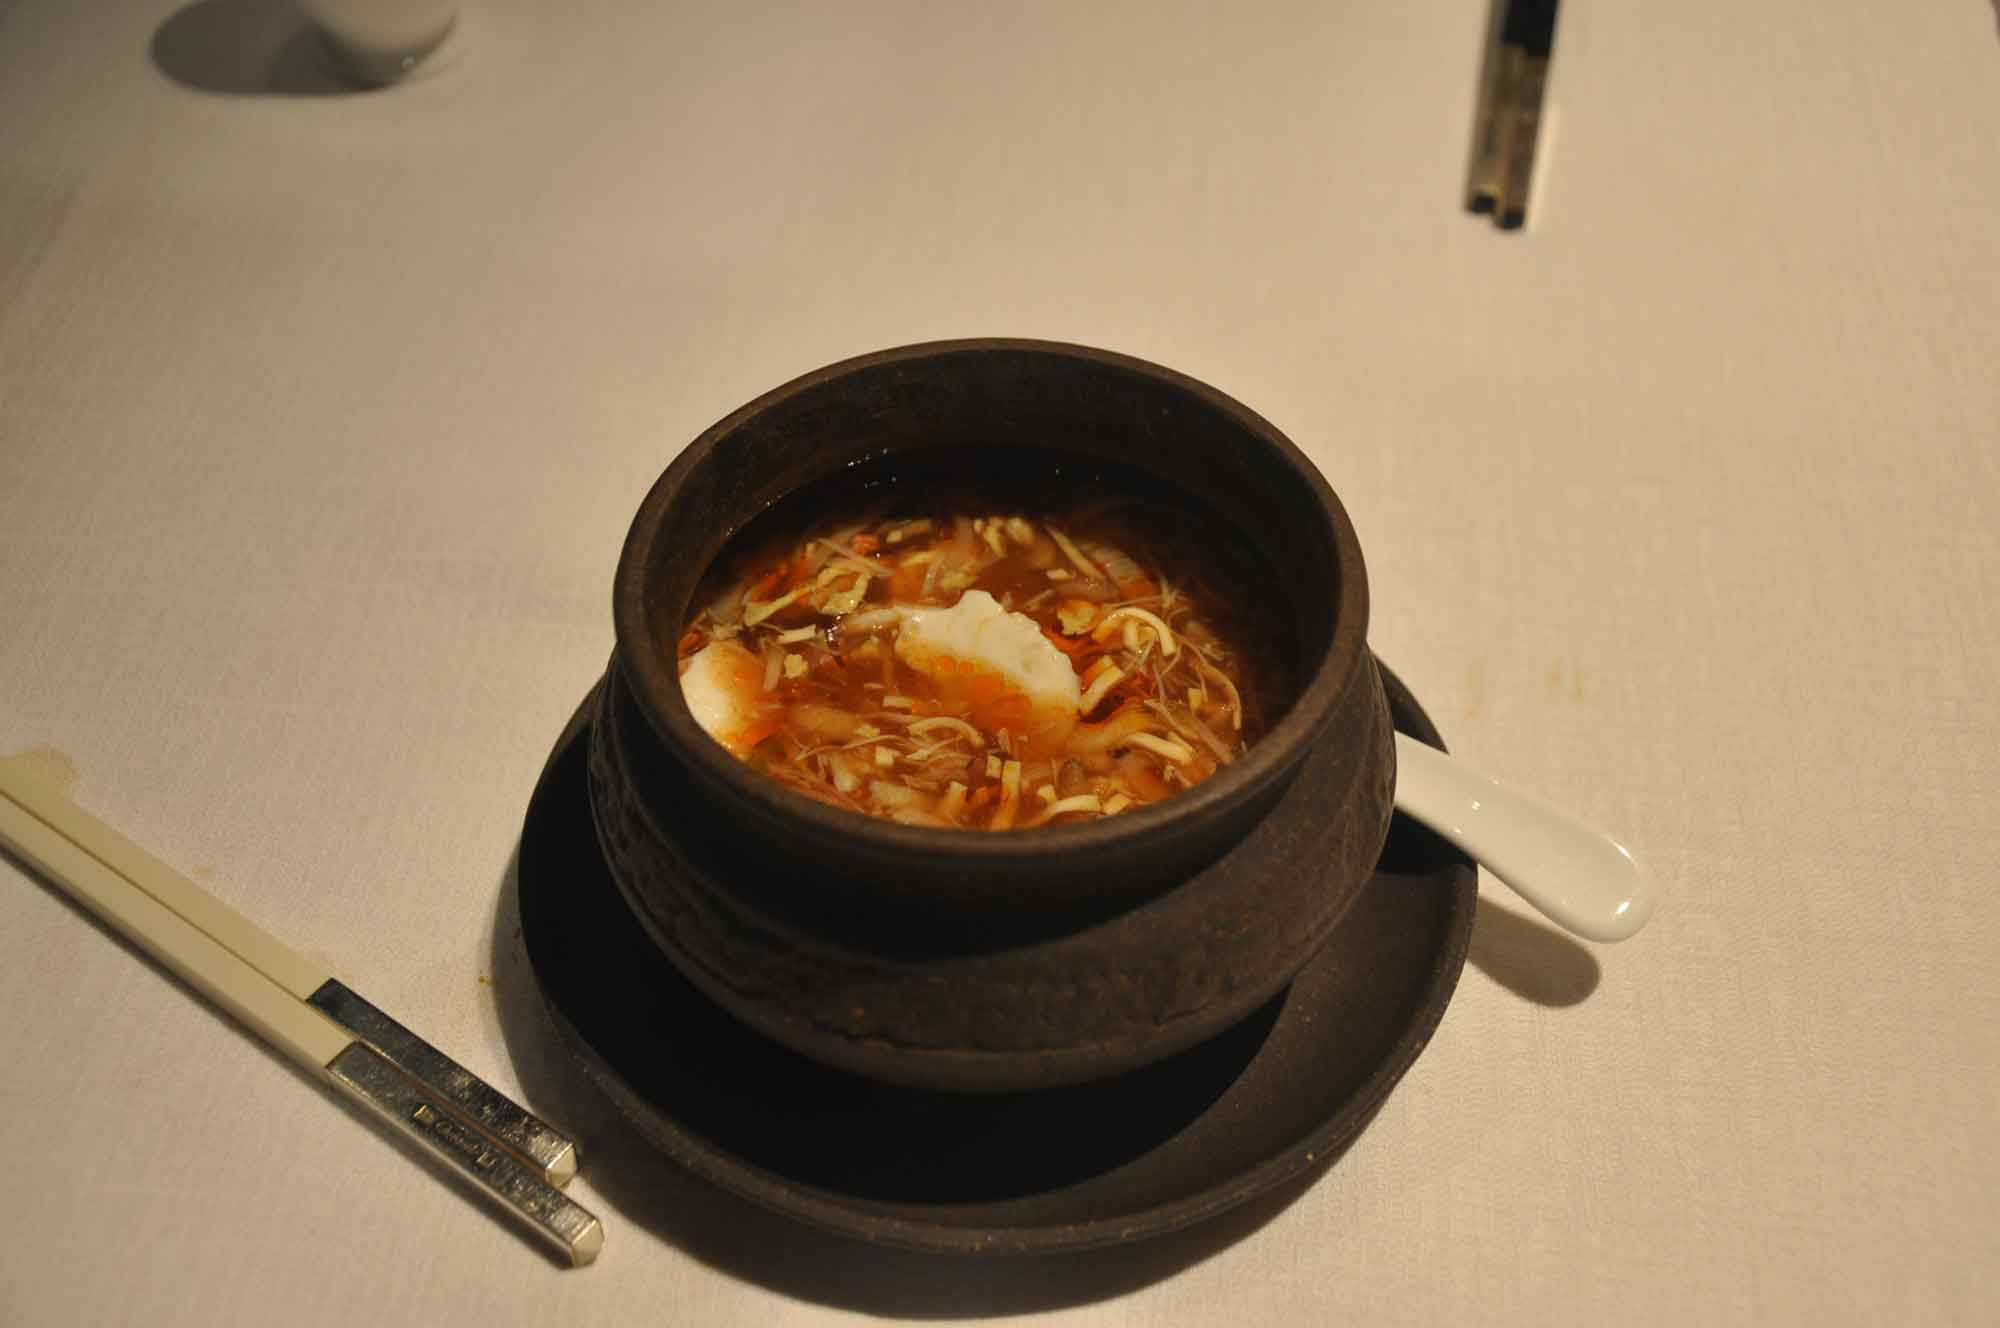 Jade Dragon Macau sour crab soup